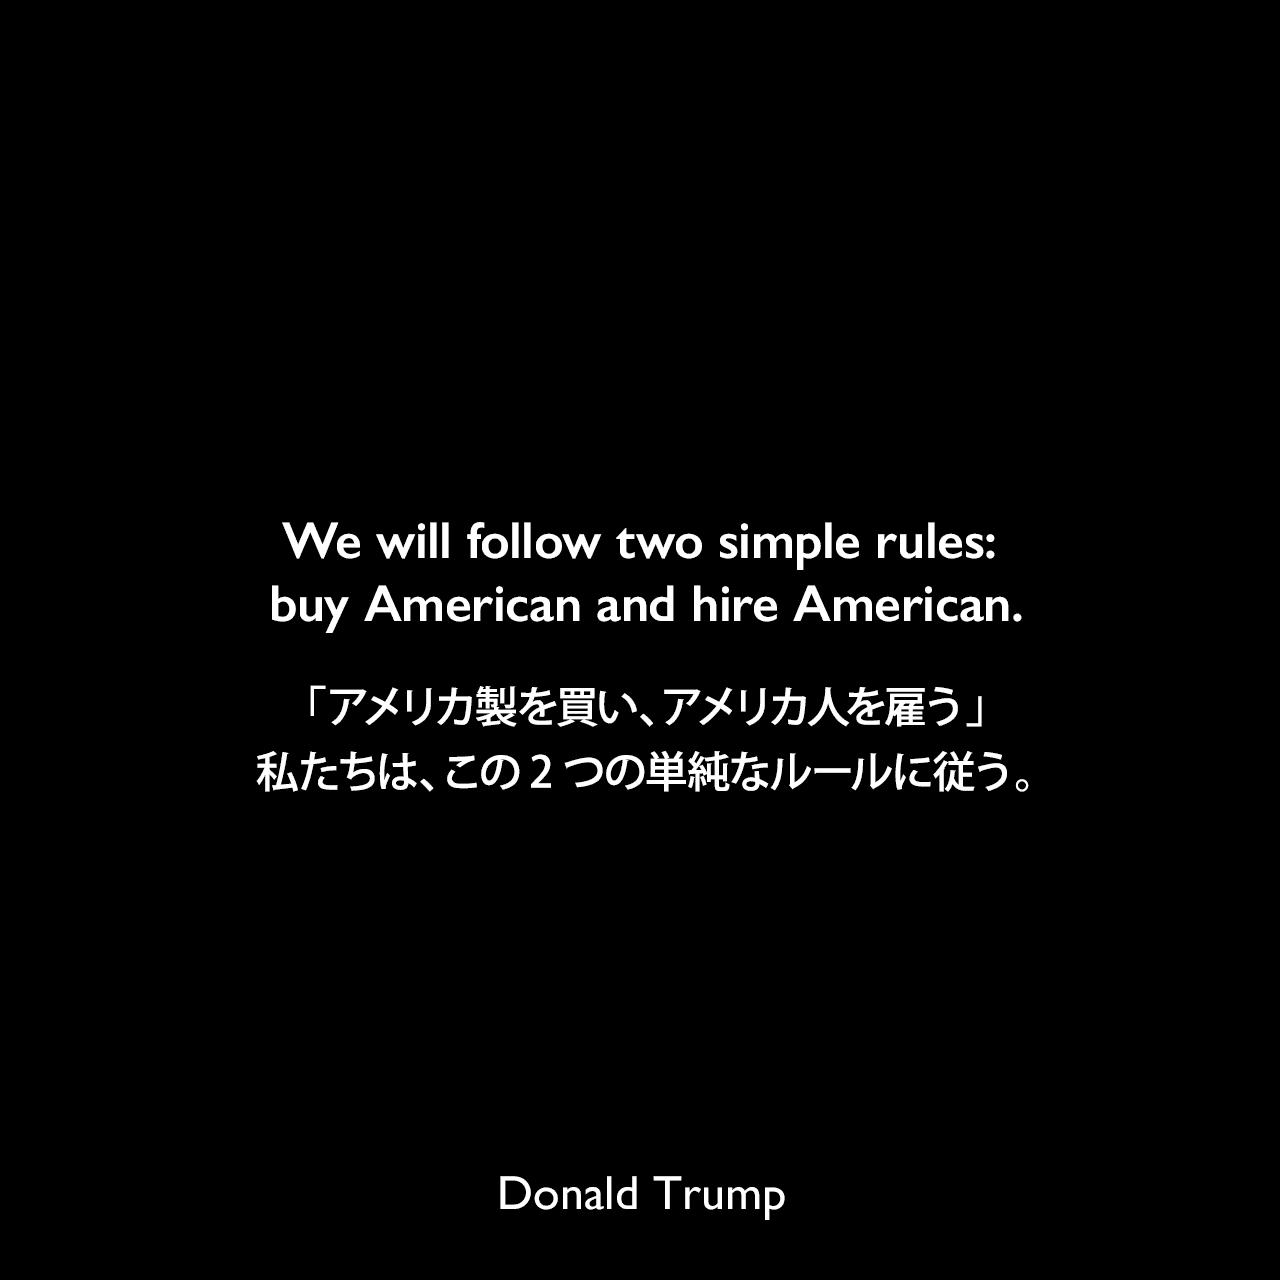 We will follow two simple rules: buy American and hire American.「アメリカ製を買い、アメリカ人を雇う」私たちは、この2つの単純なルールに従う。- 2017年の大統領就任演説よりDonald Trump